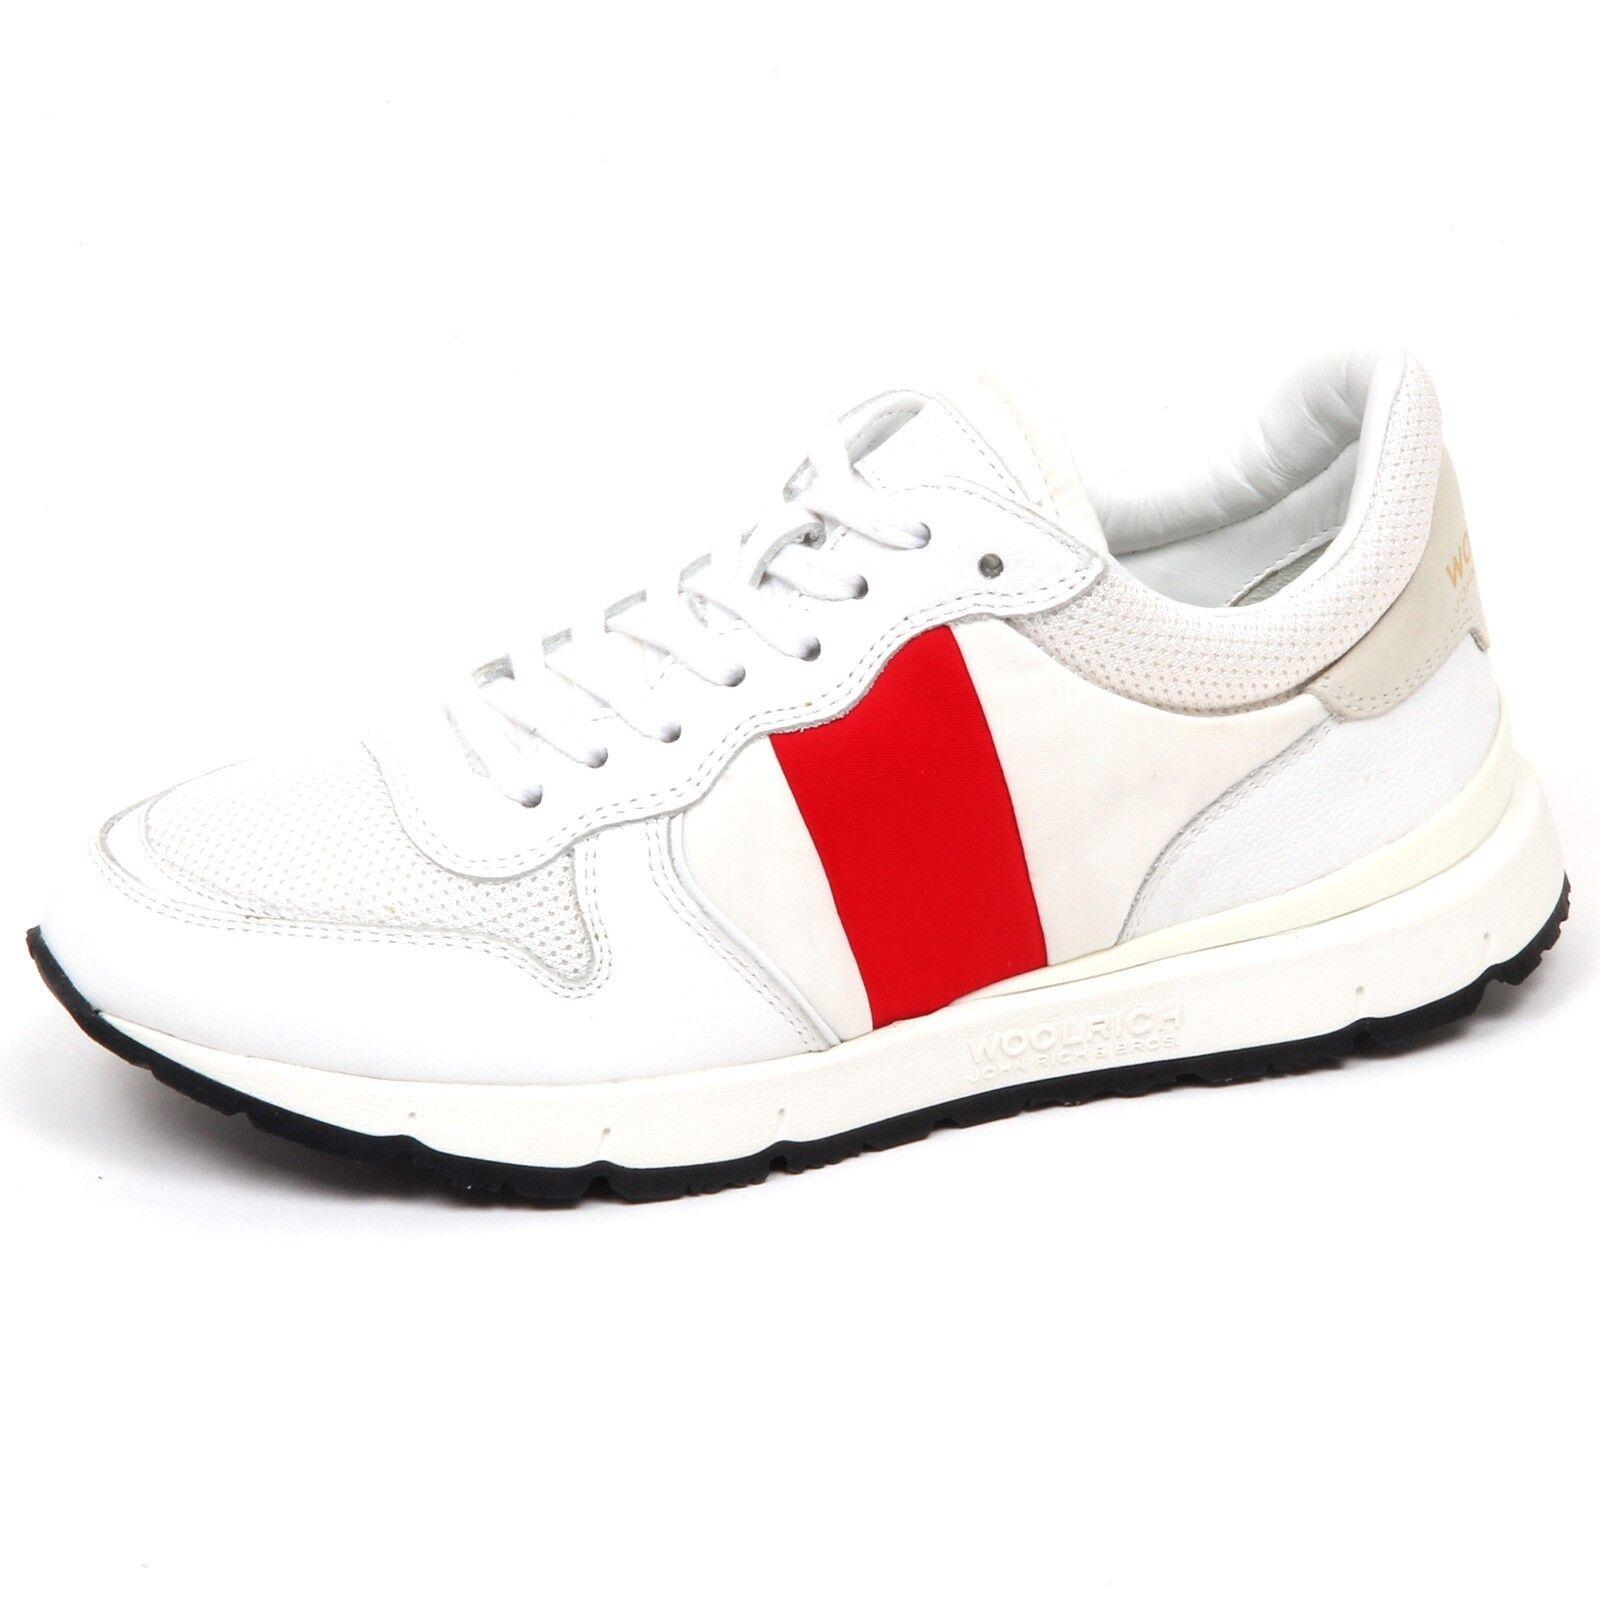 E9468 Womens Sneakers White Red Woolrich John Rich & Bros shoe woman